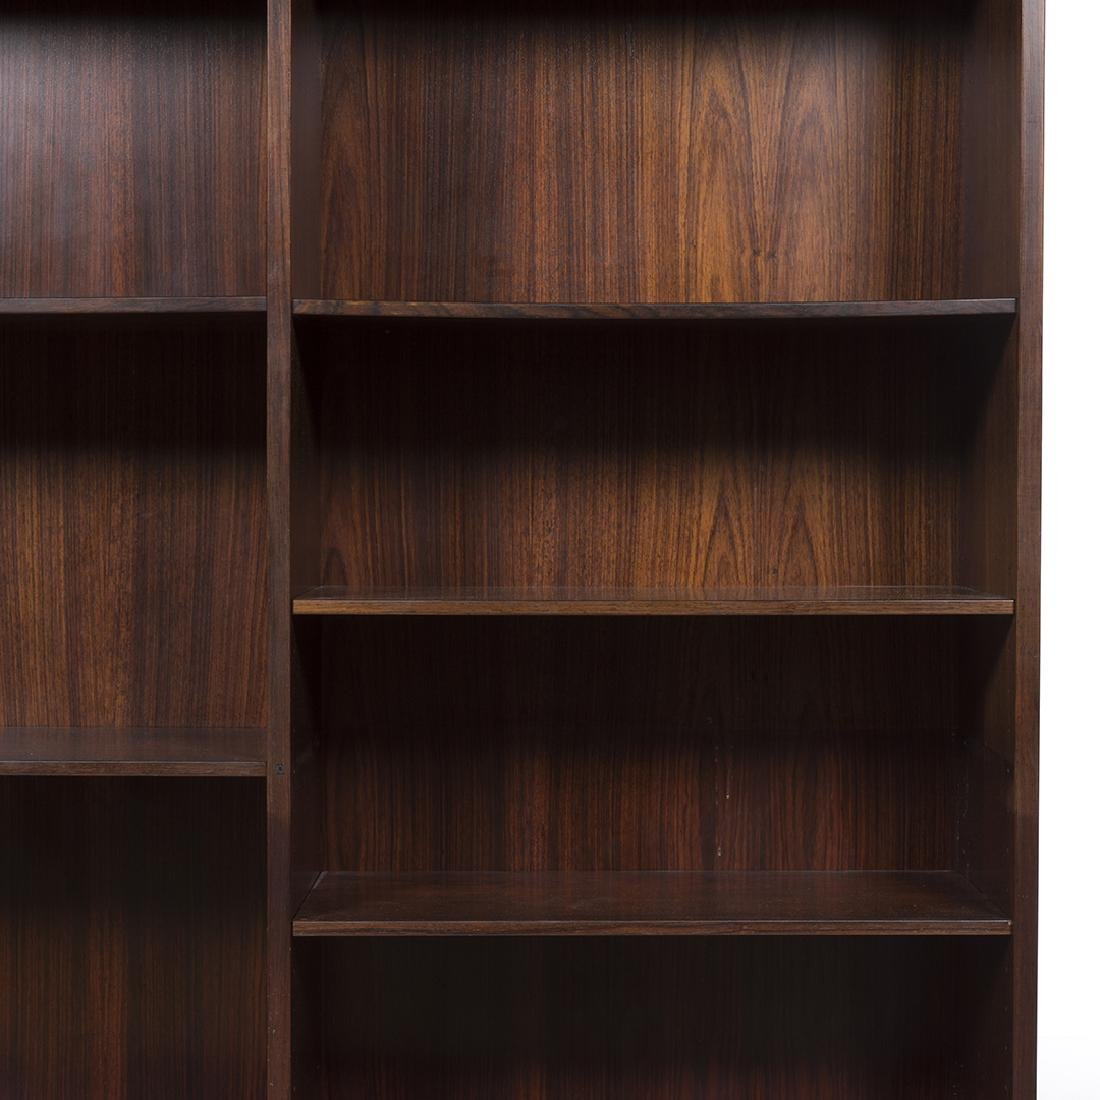 Danish Rosewood Bookcase - 4